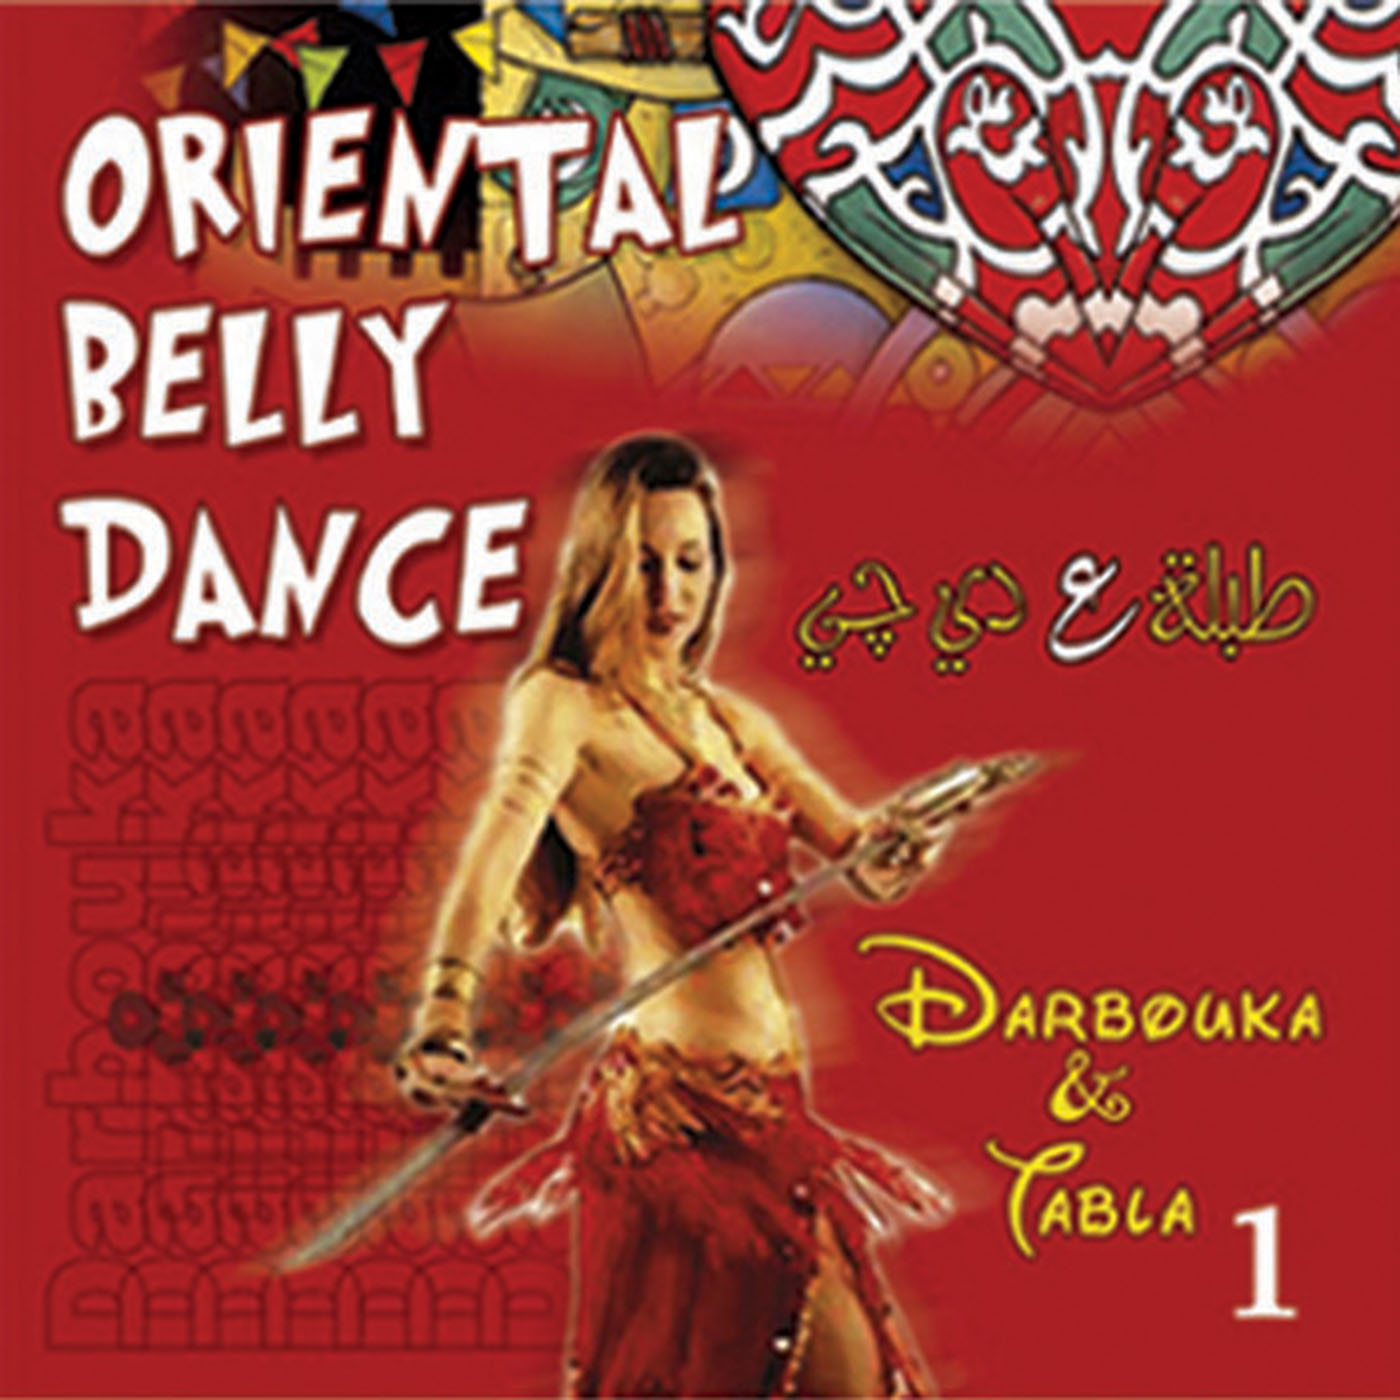 Darbouka & Tabla Vol. 1/  Wael EL-Mahallawy Fet : Medhat Playing Darbouka & Tabla    BUY IT